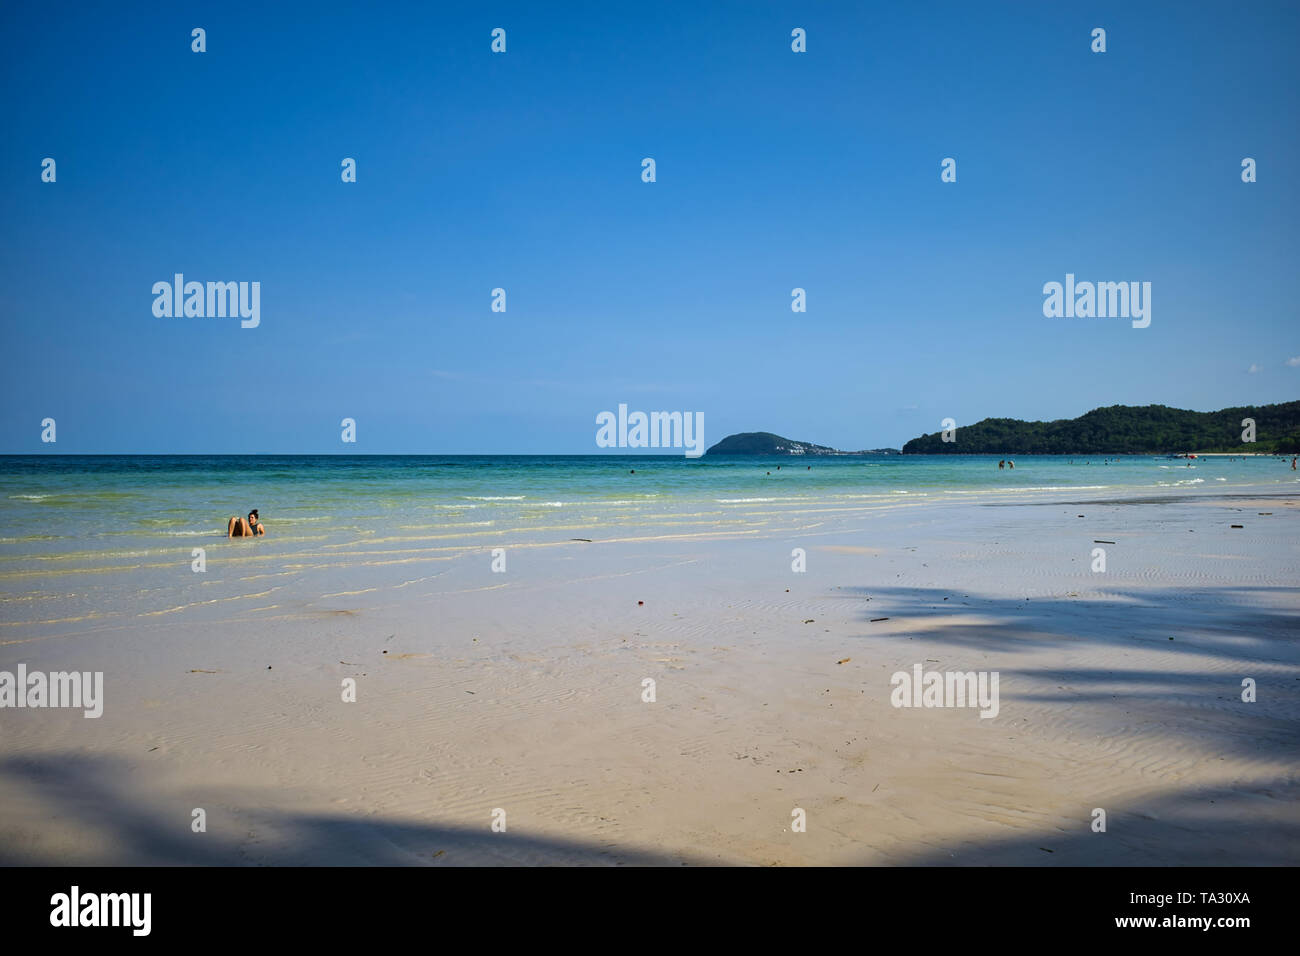 Phu Quoc island, Vietnam - March 31, 2019: White sand beach, sea horizon. Calm sea and girls walking on the beach. Coast of the South China Sea Stock Photo